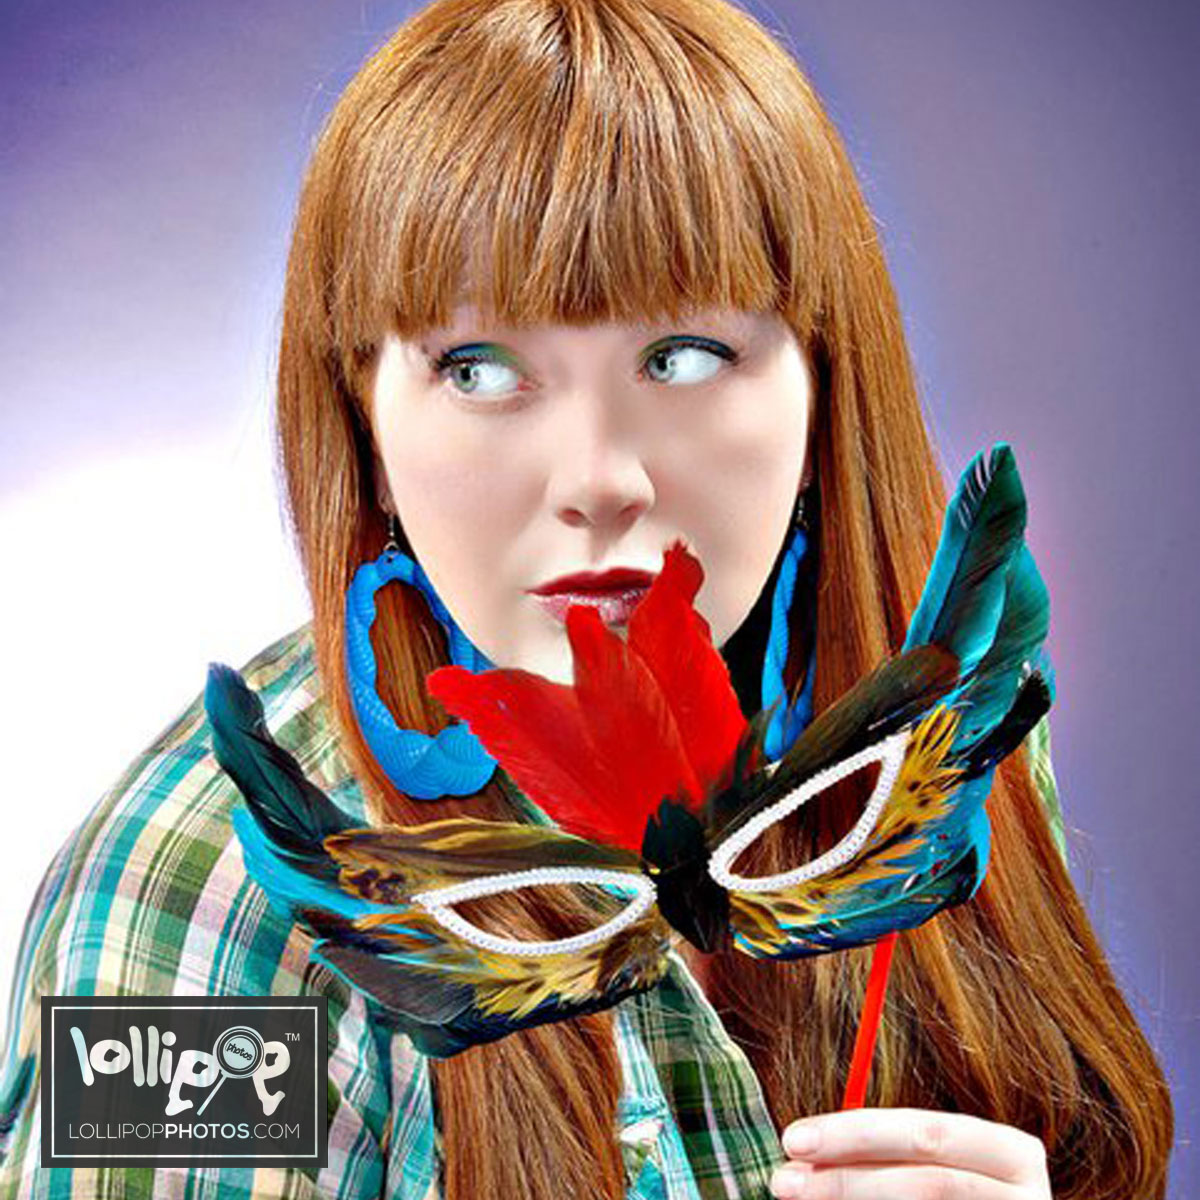 msdig-nora-canfield-lollipop-photos-520.jpg